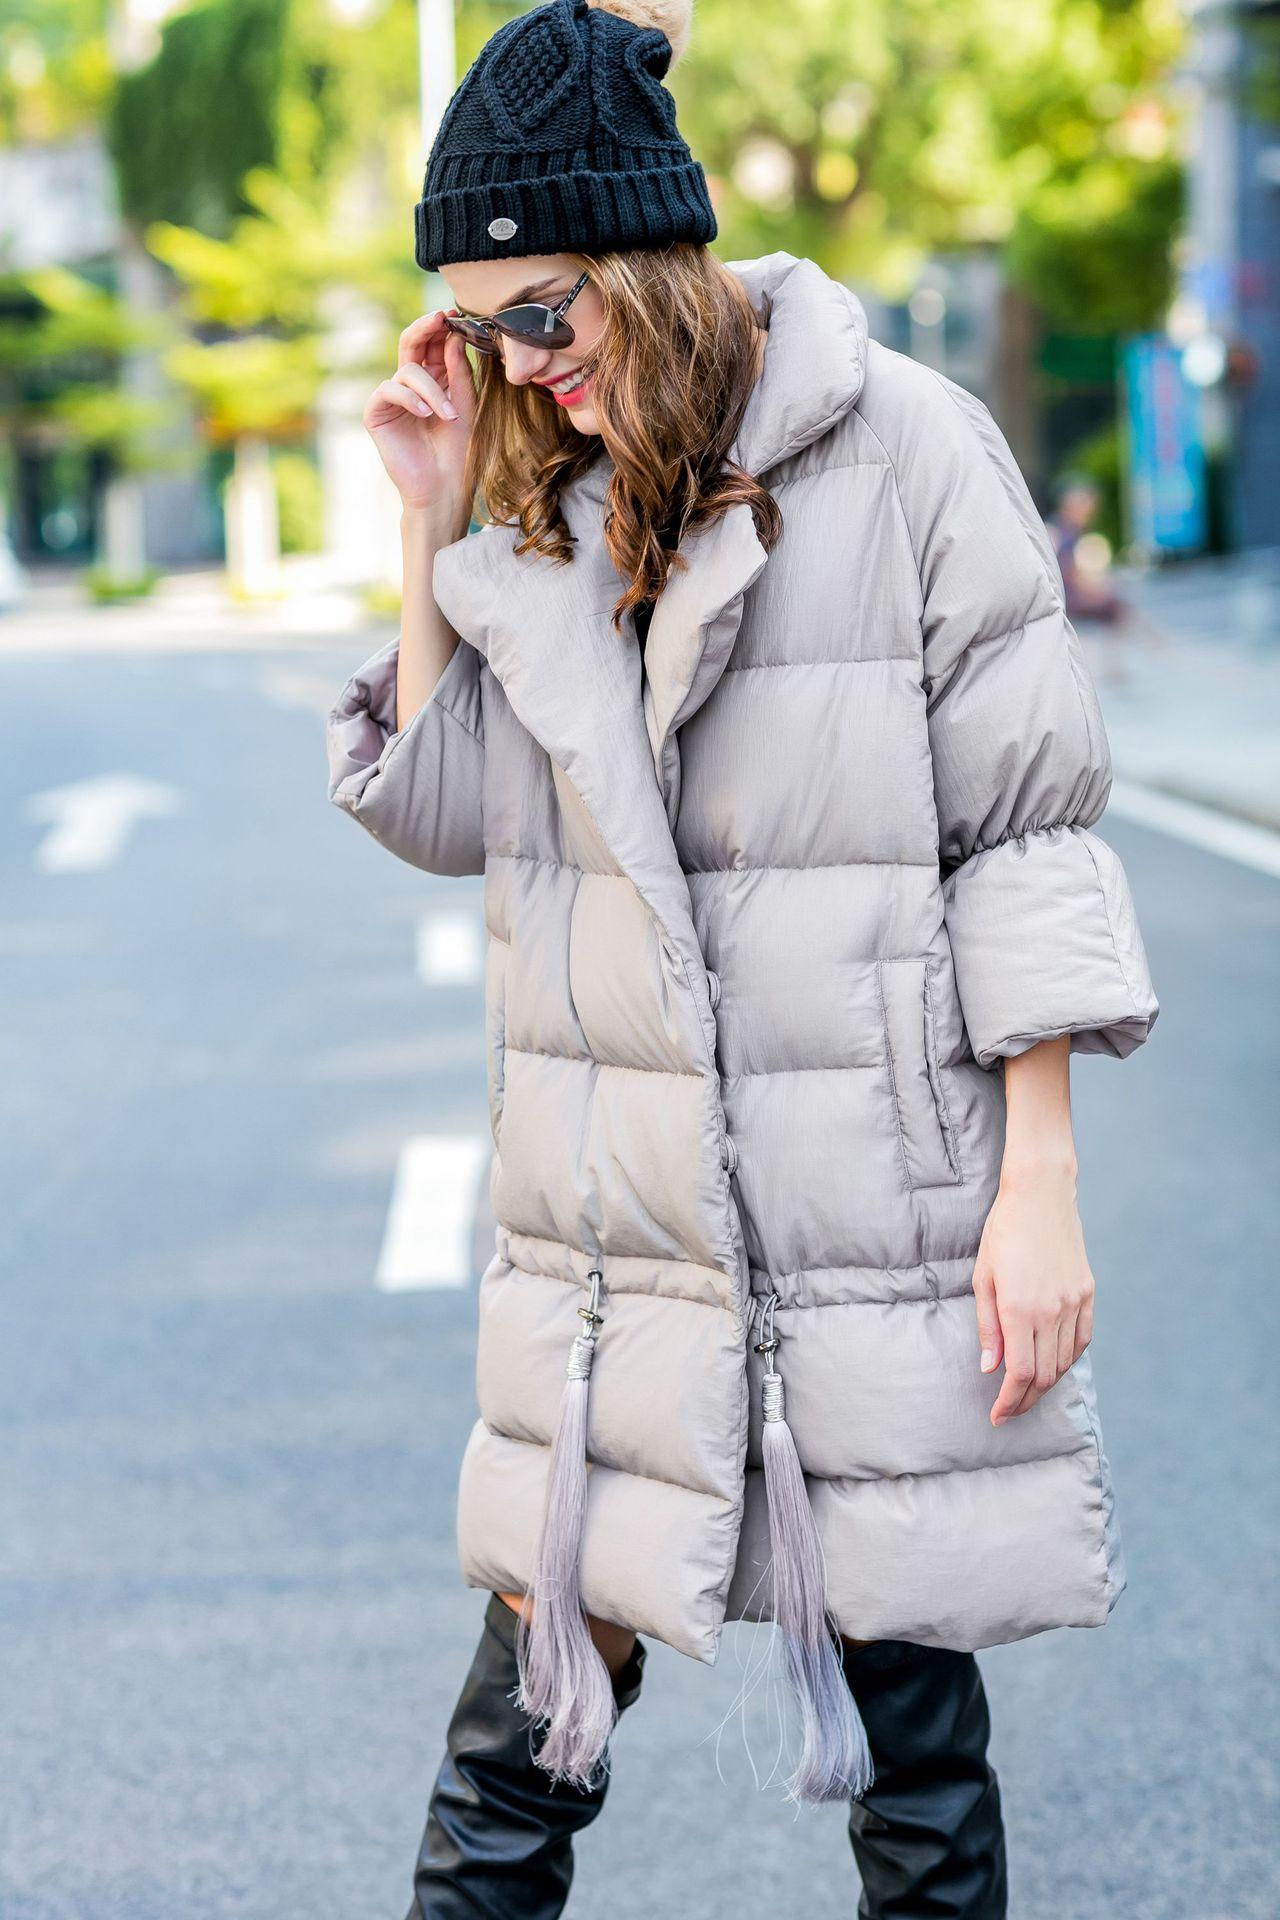 Women down coats luxury autumn winter warm fashion 90% white duck down Jackets Female lady long puffer hooded casual grey